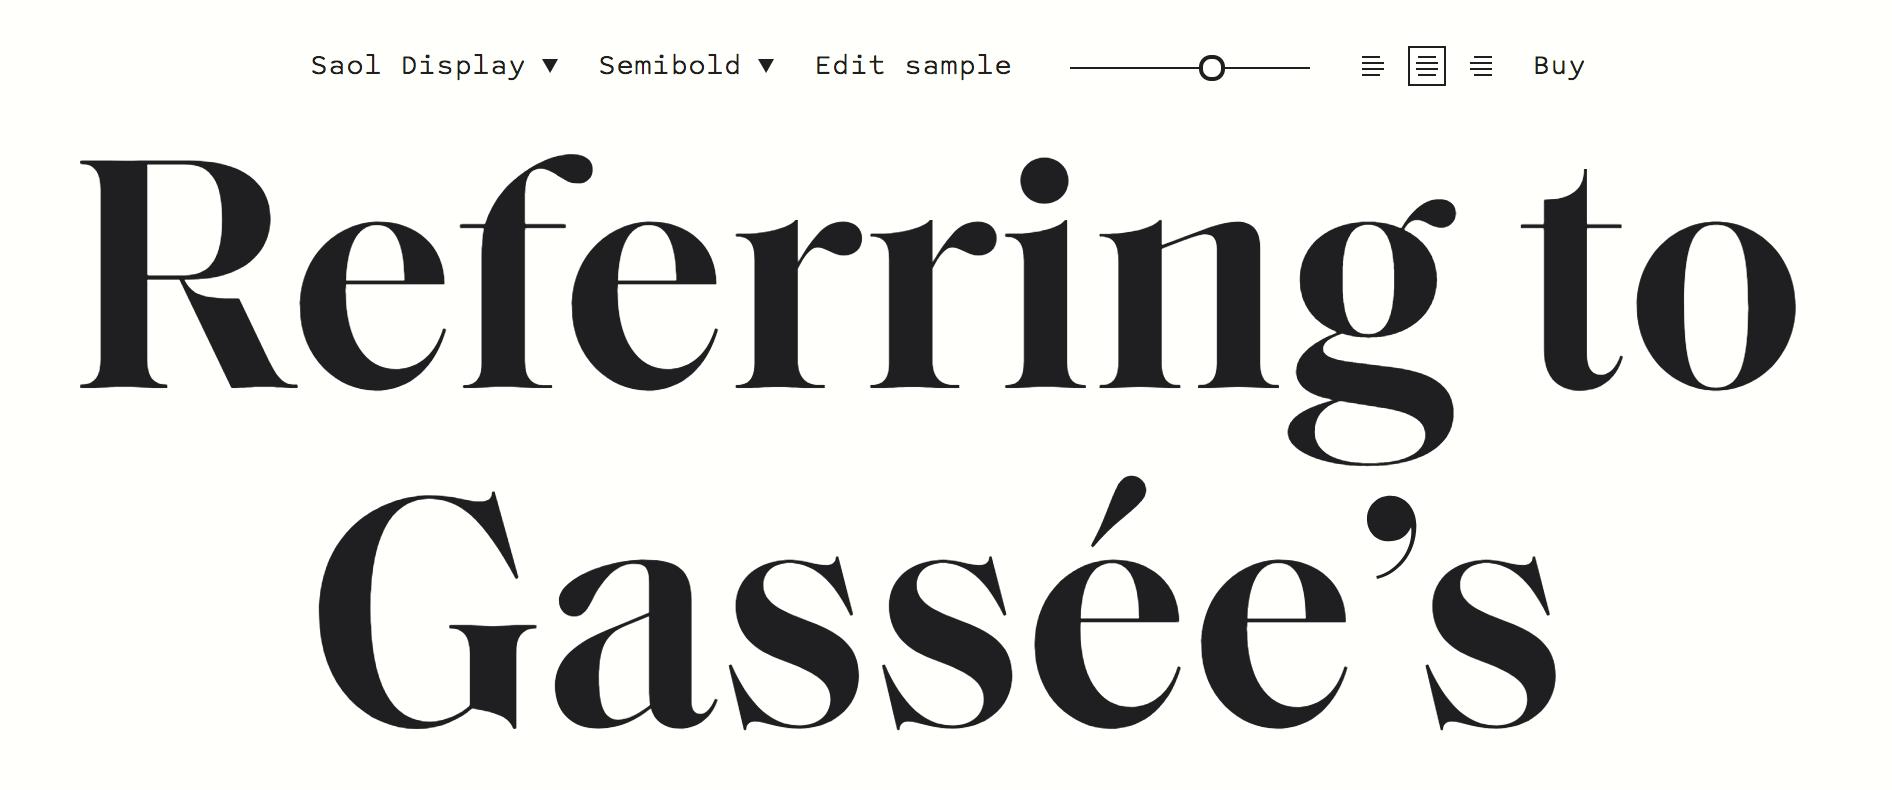 Saol Display Semibold   Fonts       Typography   Typography